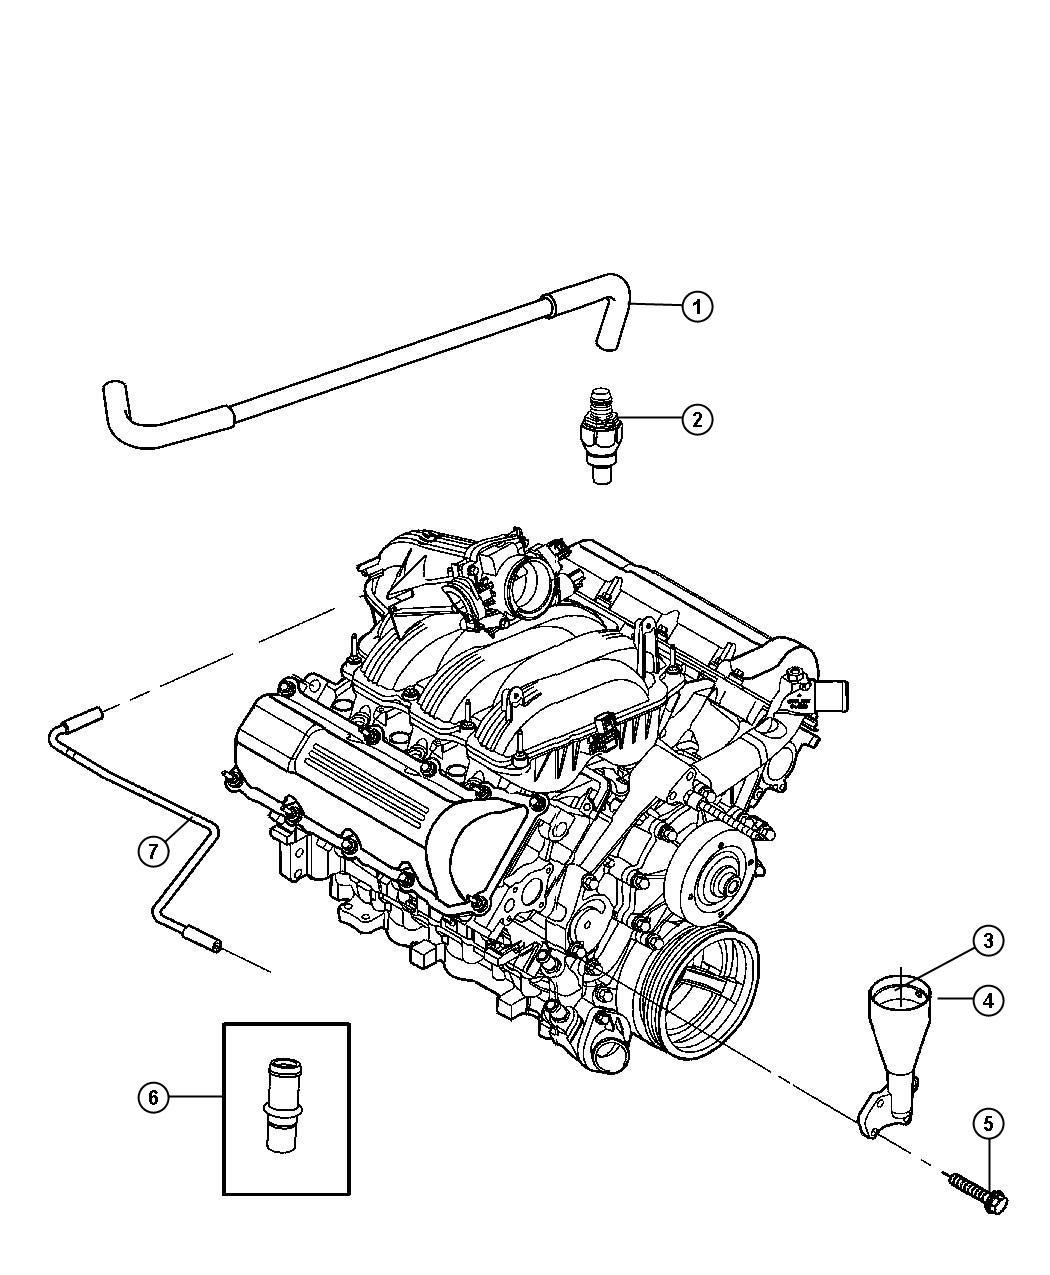 Jeep Commander Crankcase Ventilation 4 7l Eva